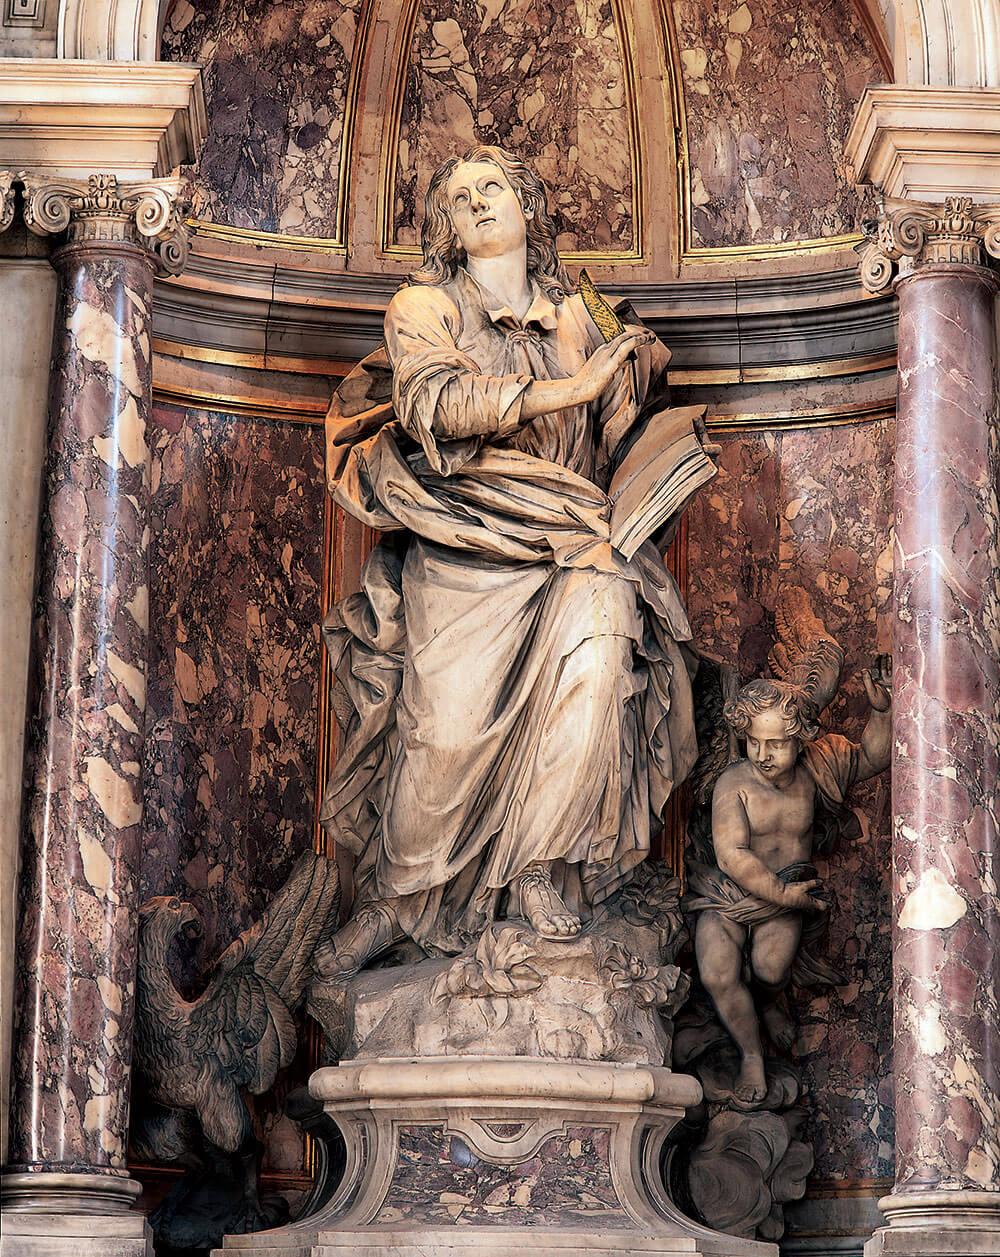 San Giovanni Evangelista 1732-1733, Giovanni Maria Morlaiter